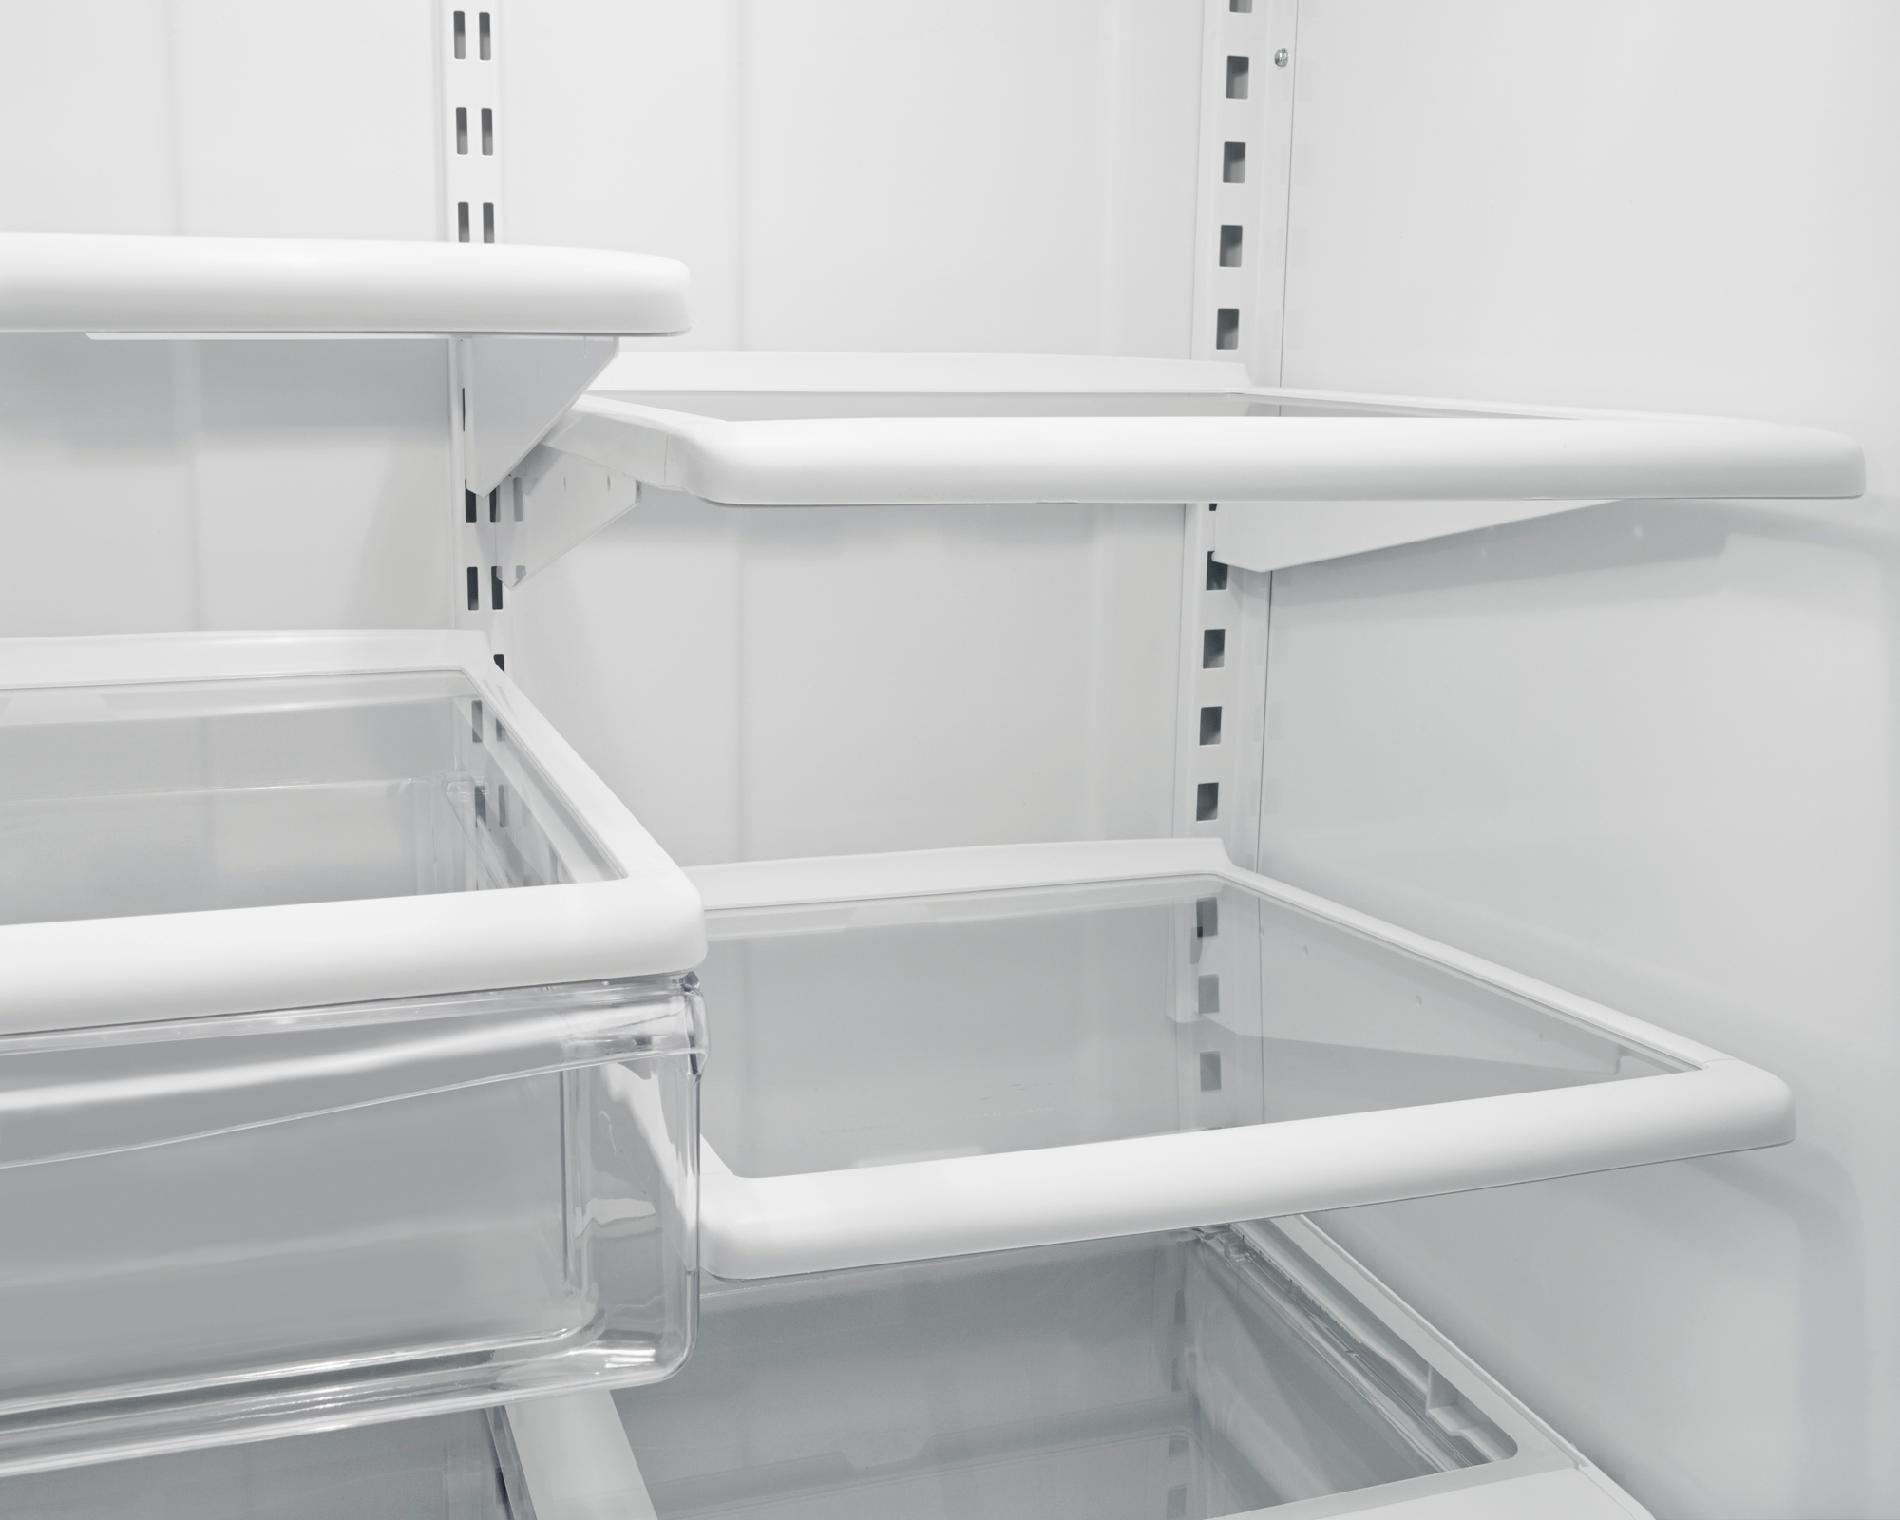 Whirlpool WRB322DMBB 22.1 cu. ft. Bottom-Freezer Refrigerator w/ Ice Maker - Black